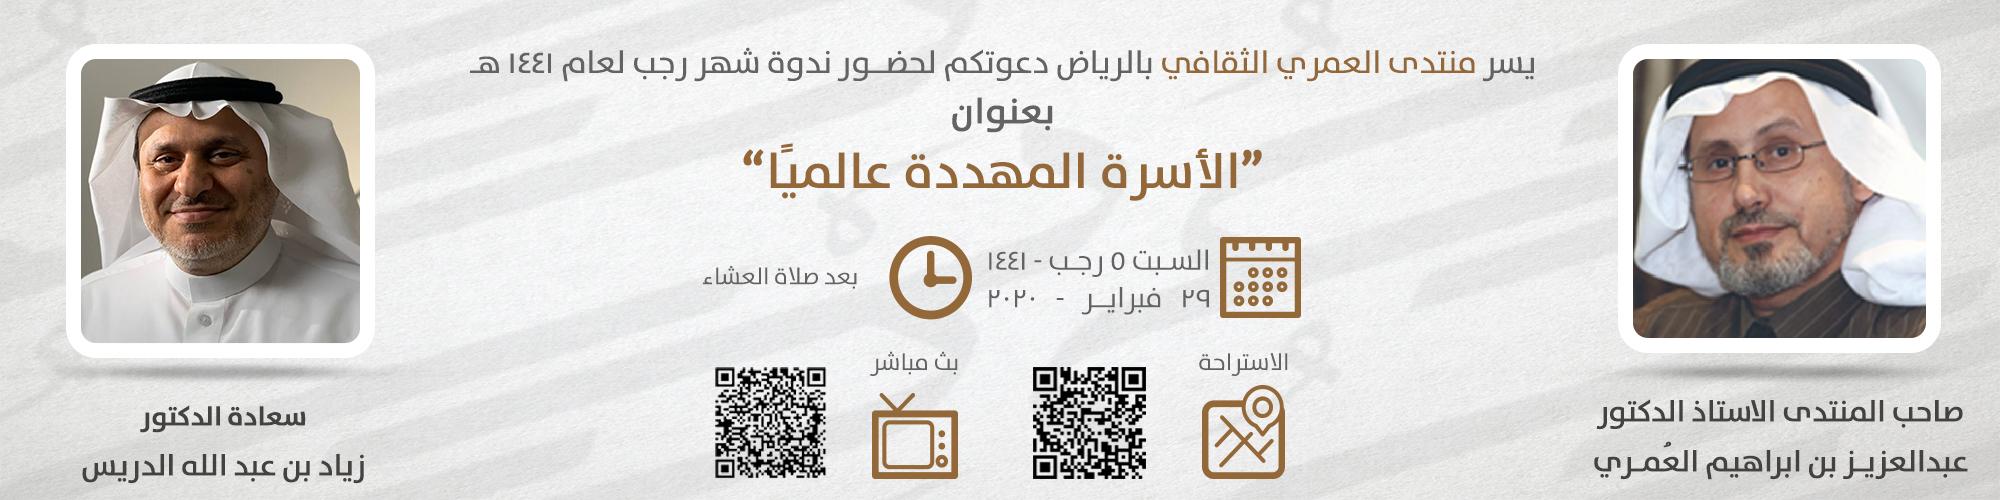 http://omaryforum.com/wp-content/uploads/2020/02/تصميم-ندوة-رجب-الأسرة-المهددة-عالميًا.jpg